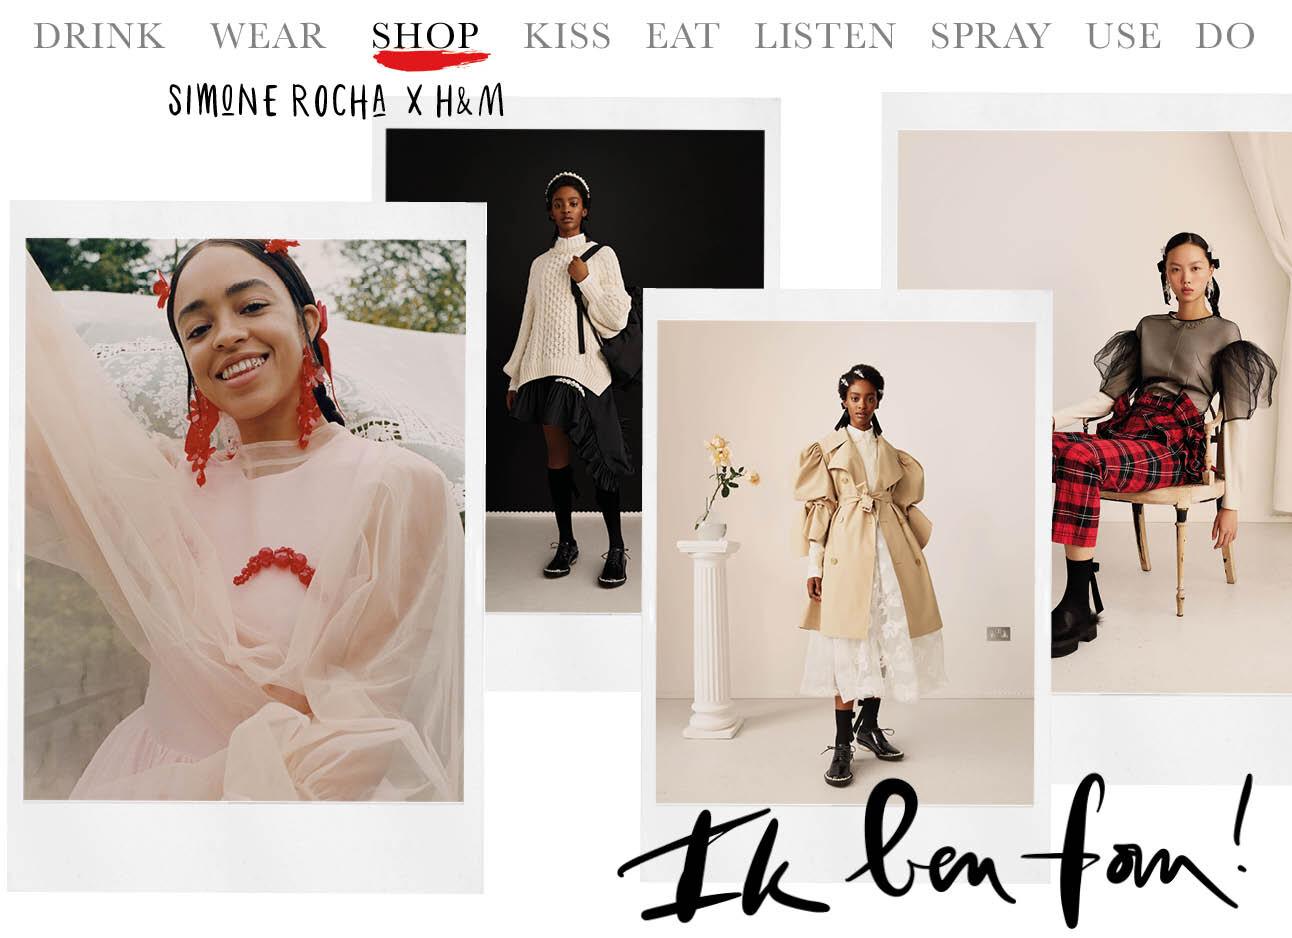 Today we shop: Simon Rocha x H&M